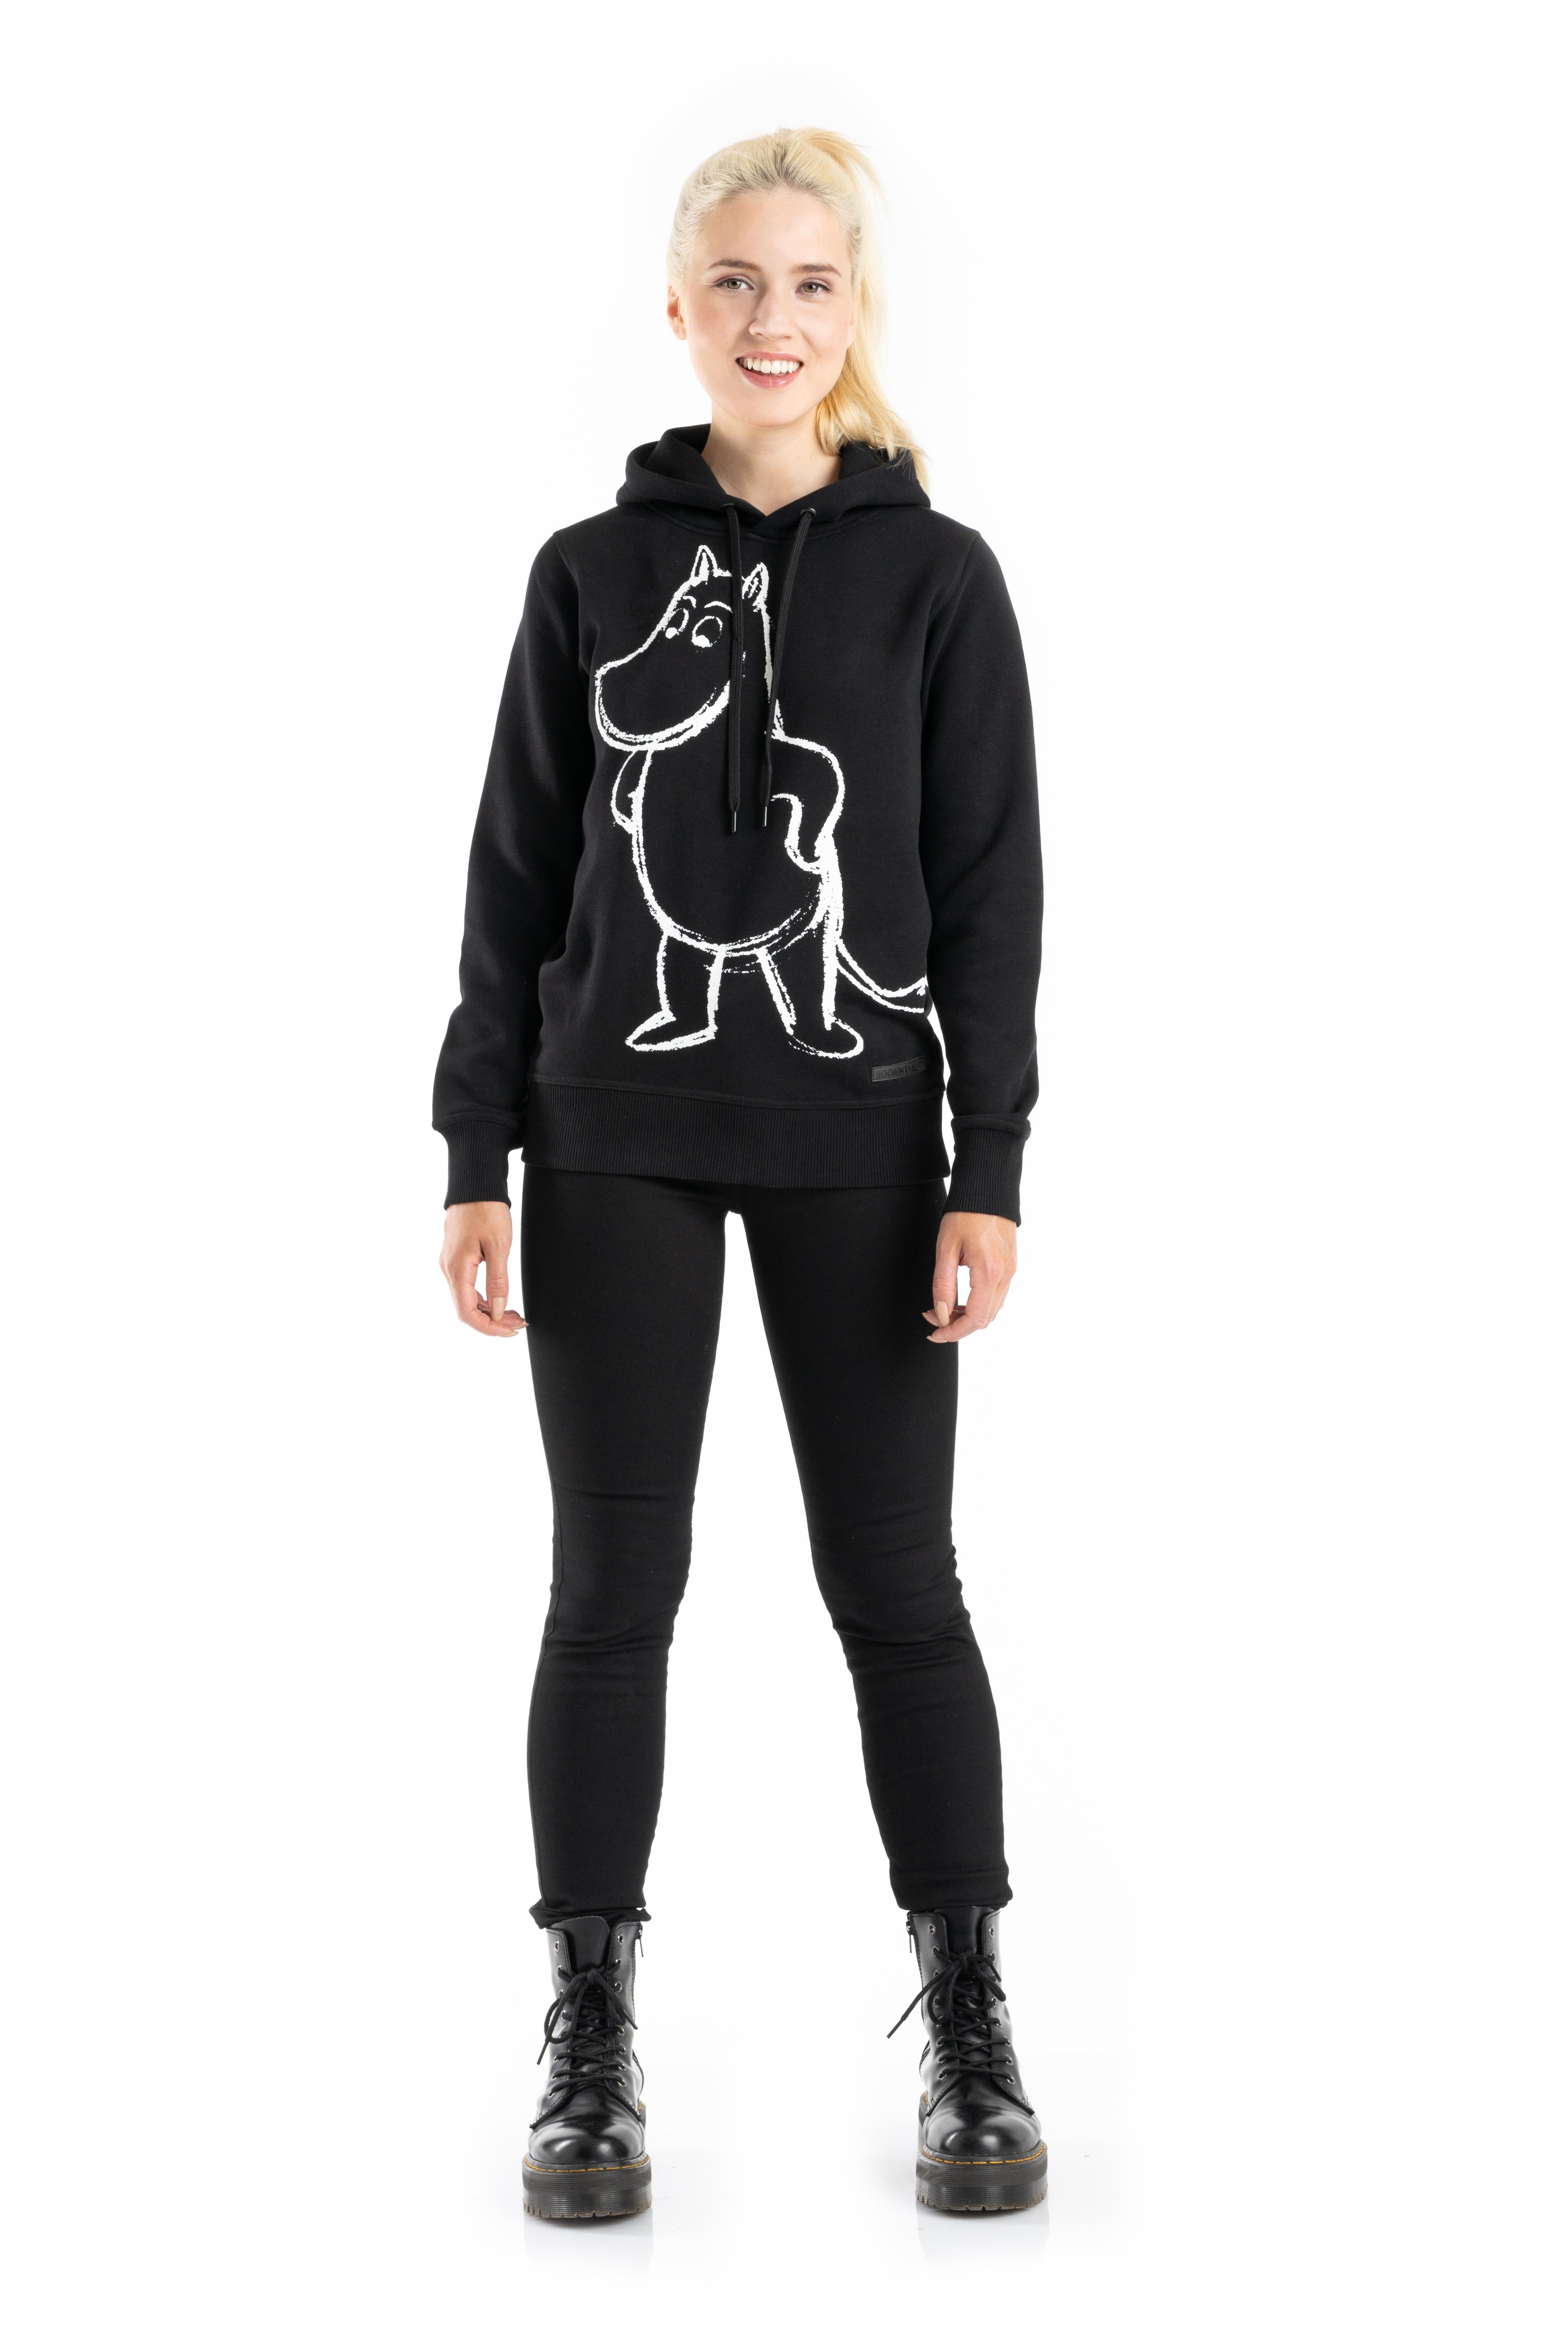 Martinex Moomin Lilli Sketch Hoodie Moomintroll Black